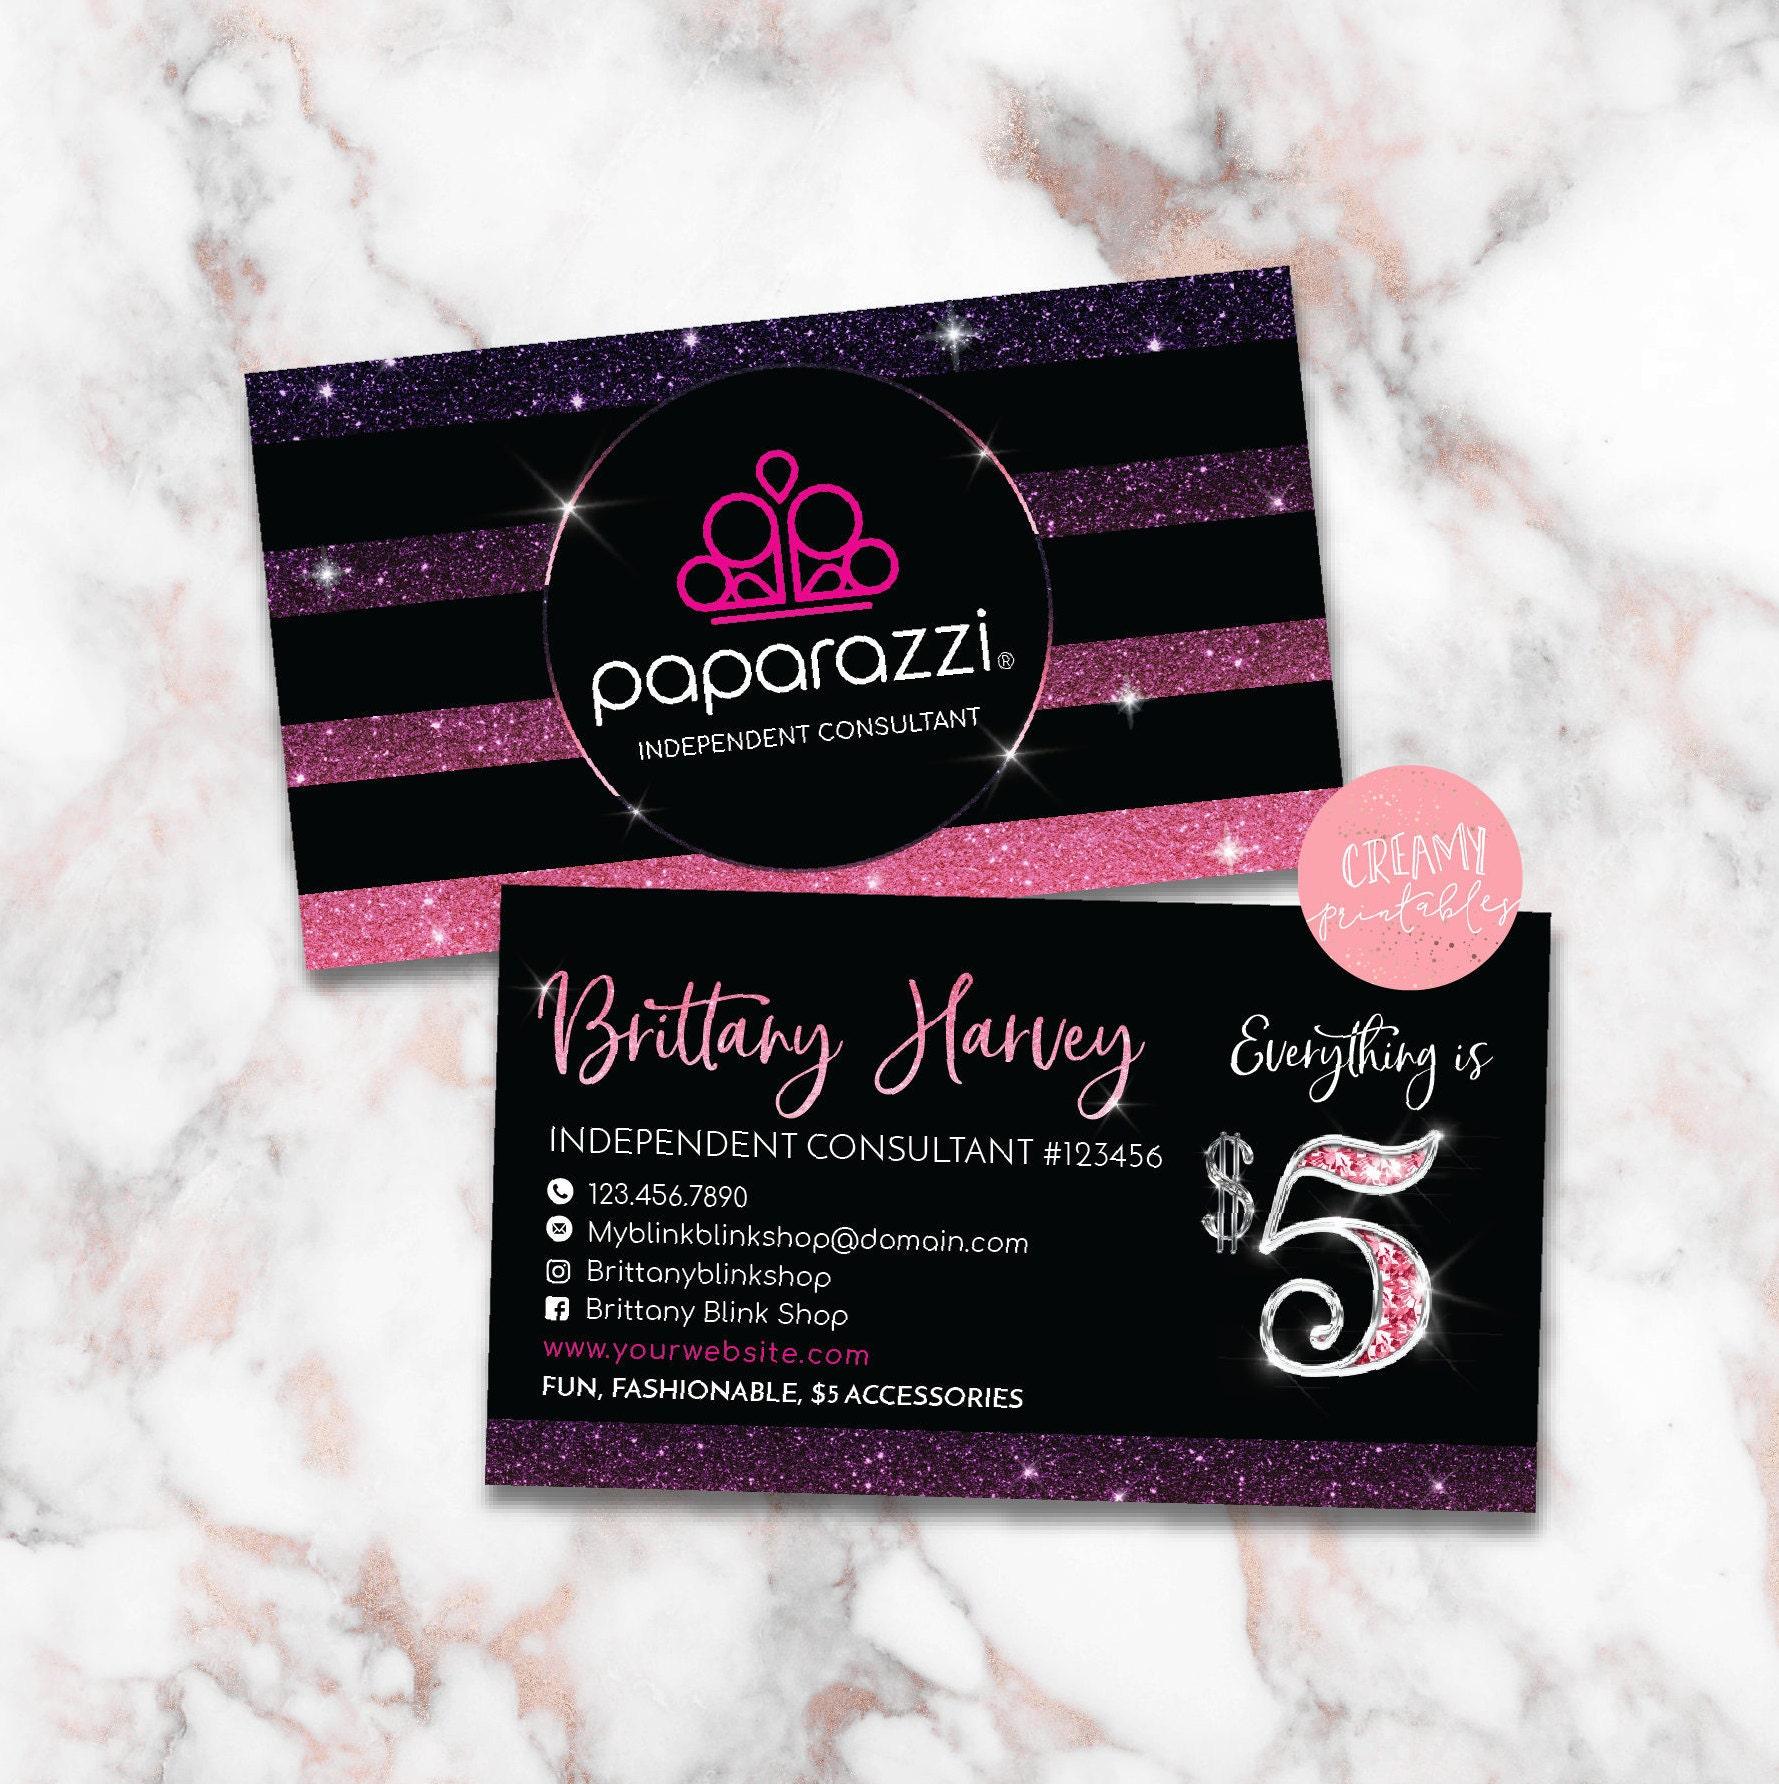 Paparazzi Business Cards Free Personalized Paparazzi Jewelry